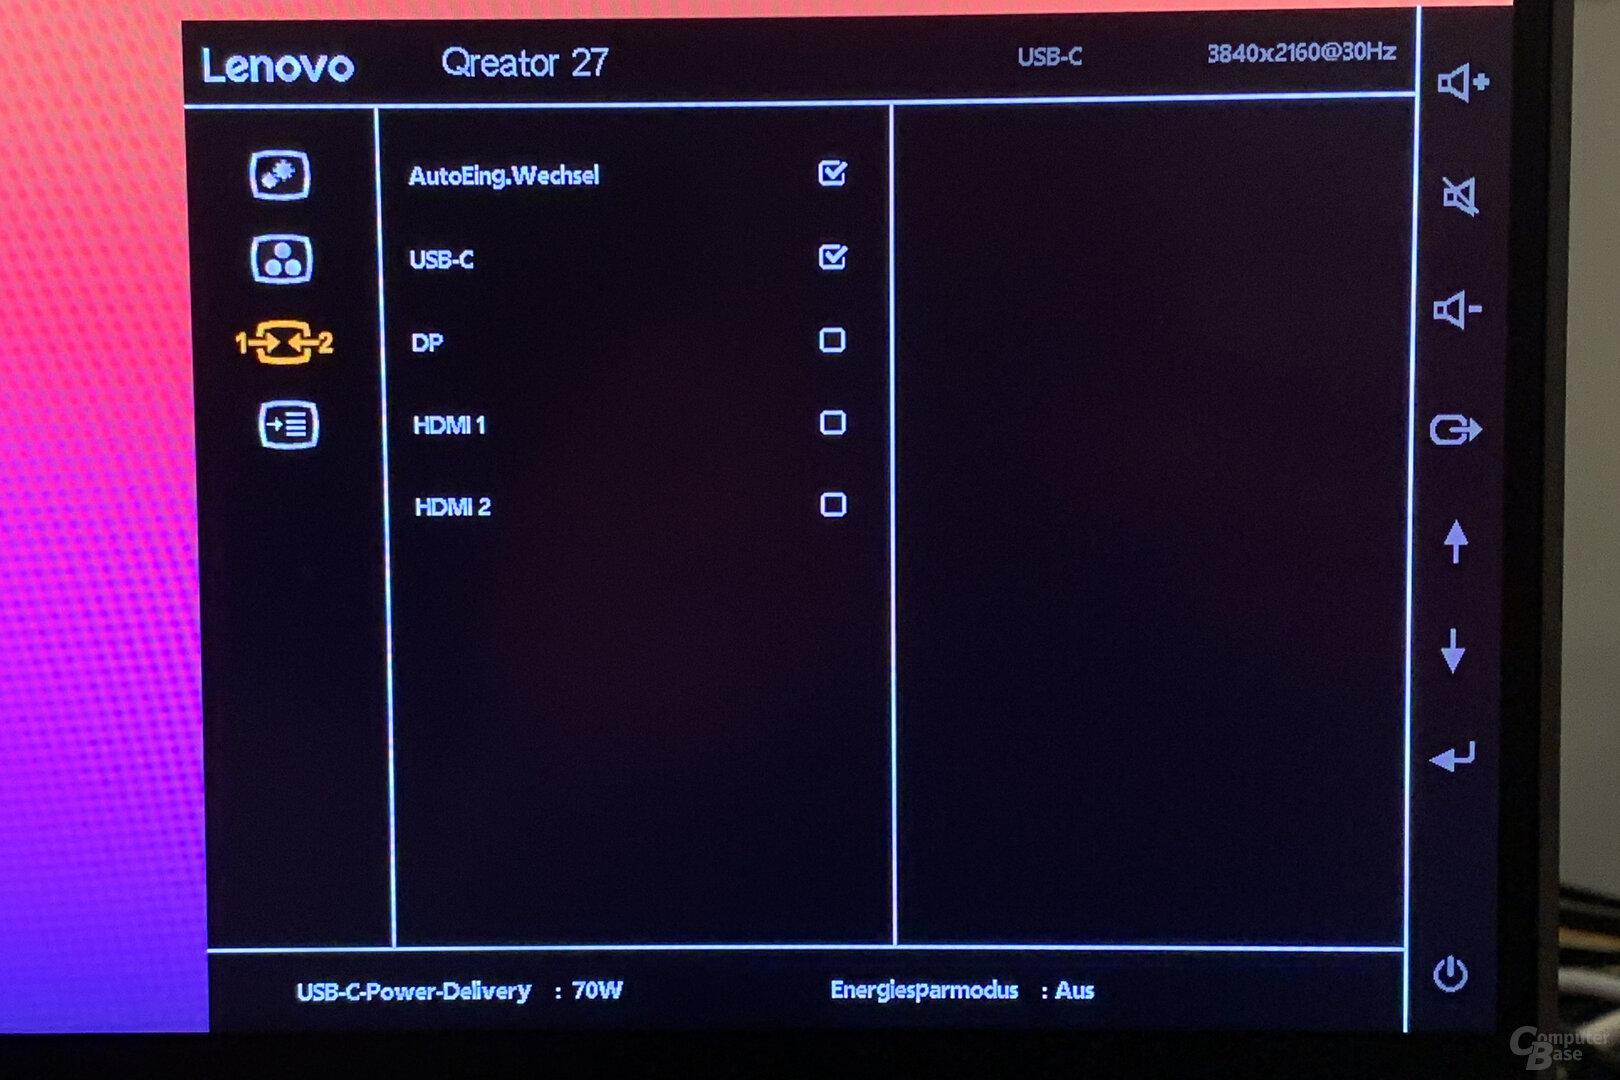 OSD des Lenovo Qreator 27